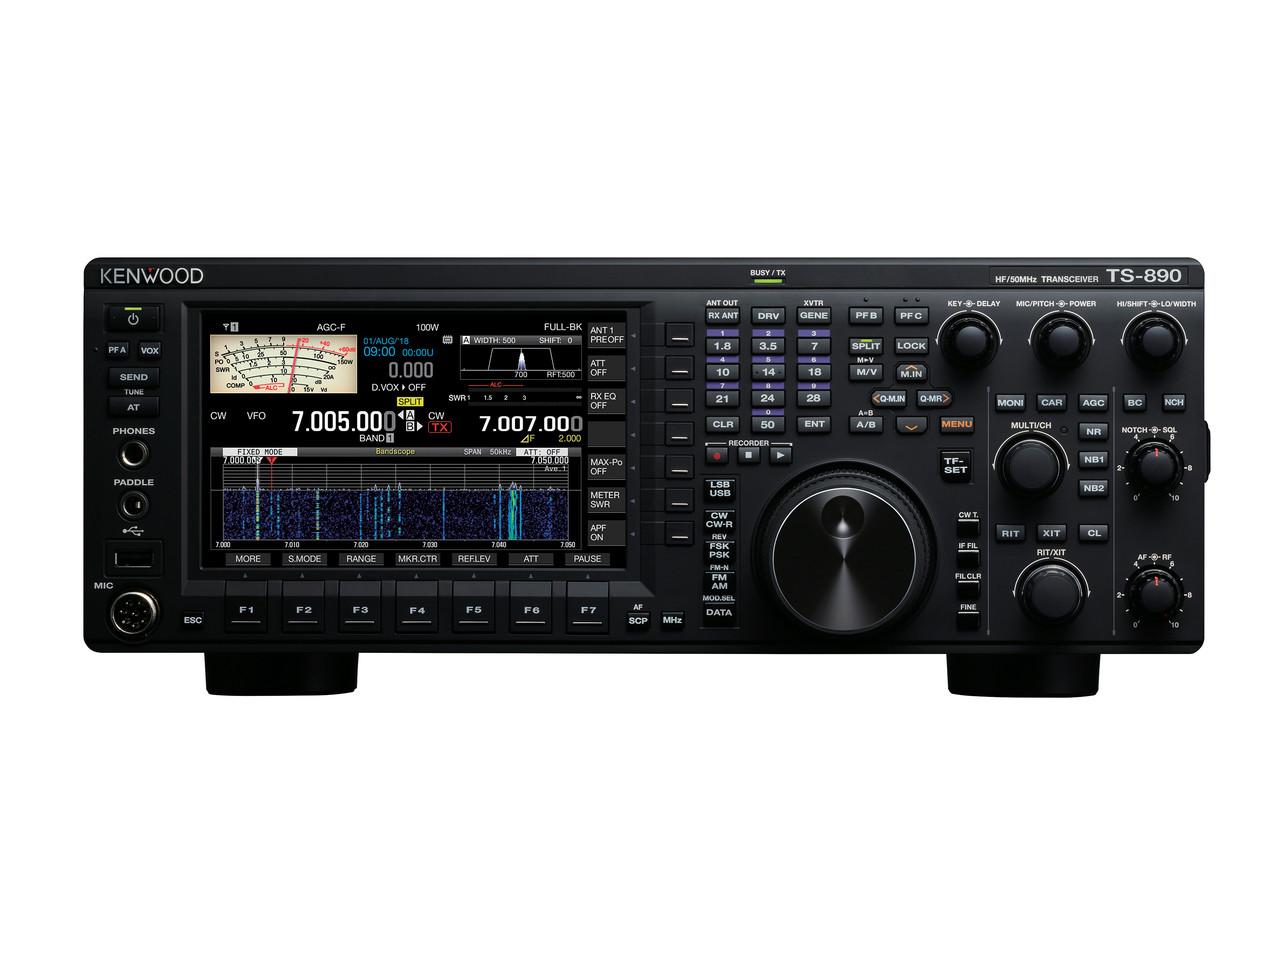 KENWOOD TS-890S HF + 6 METER TRANSCEIVER